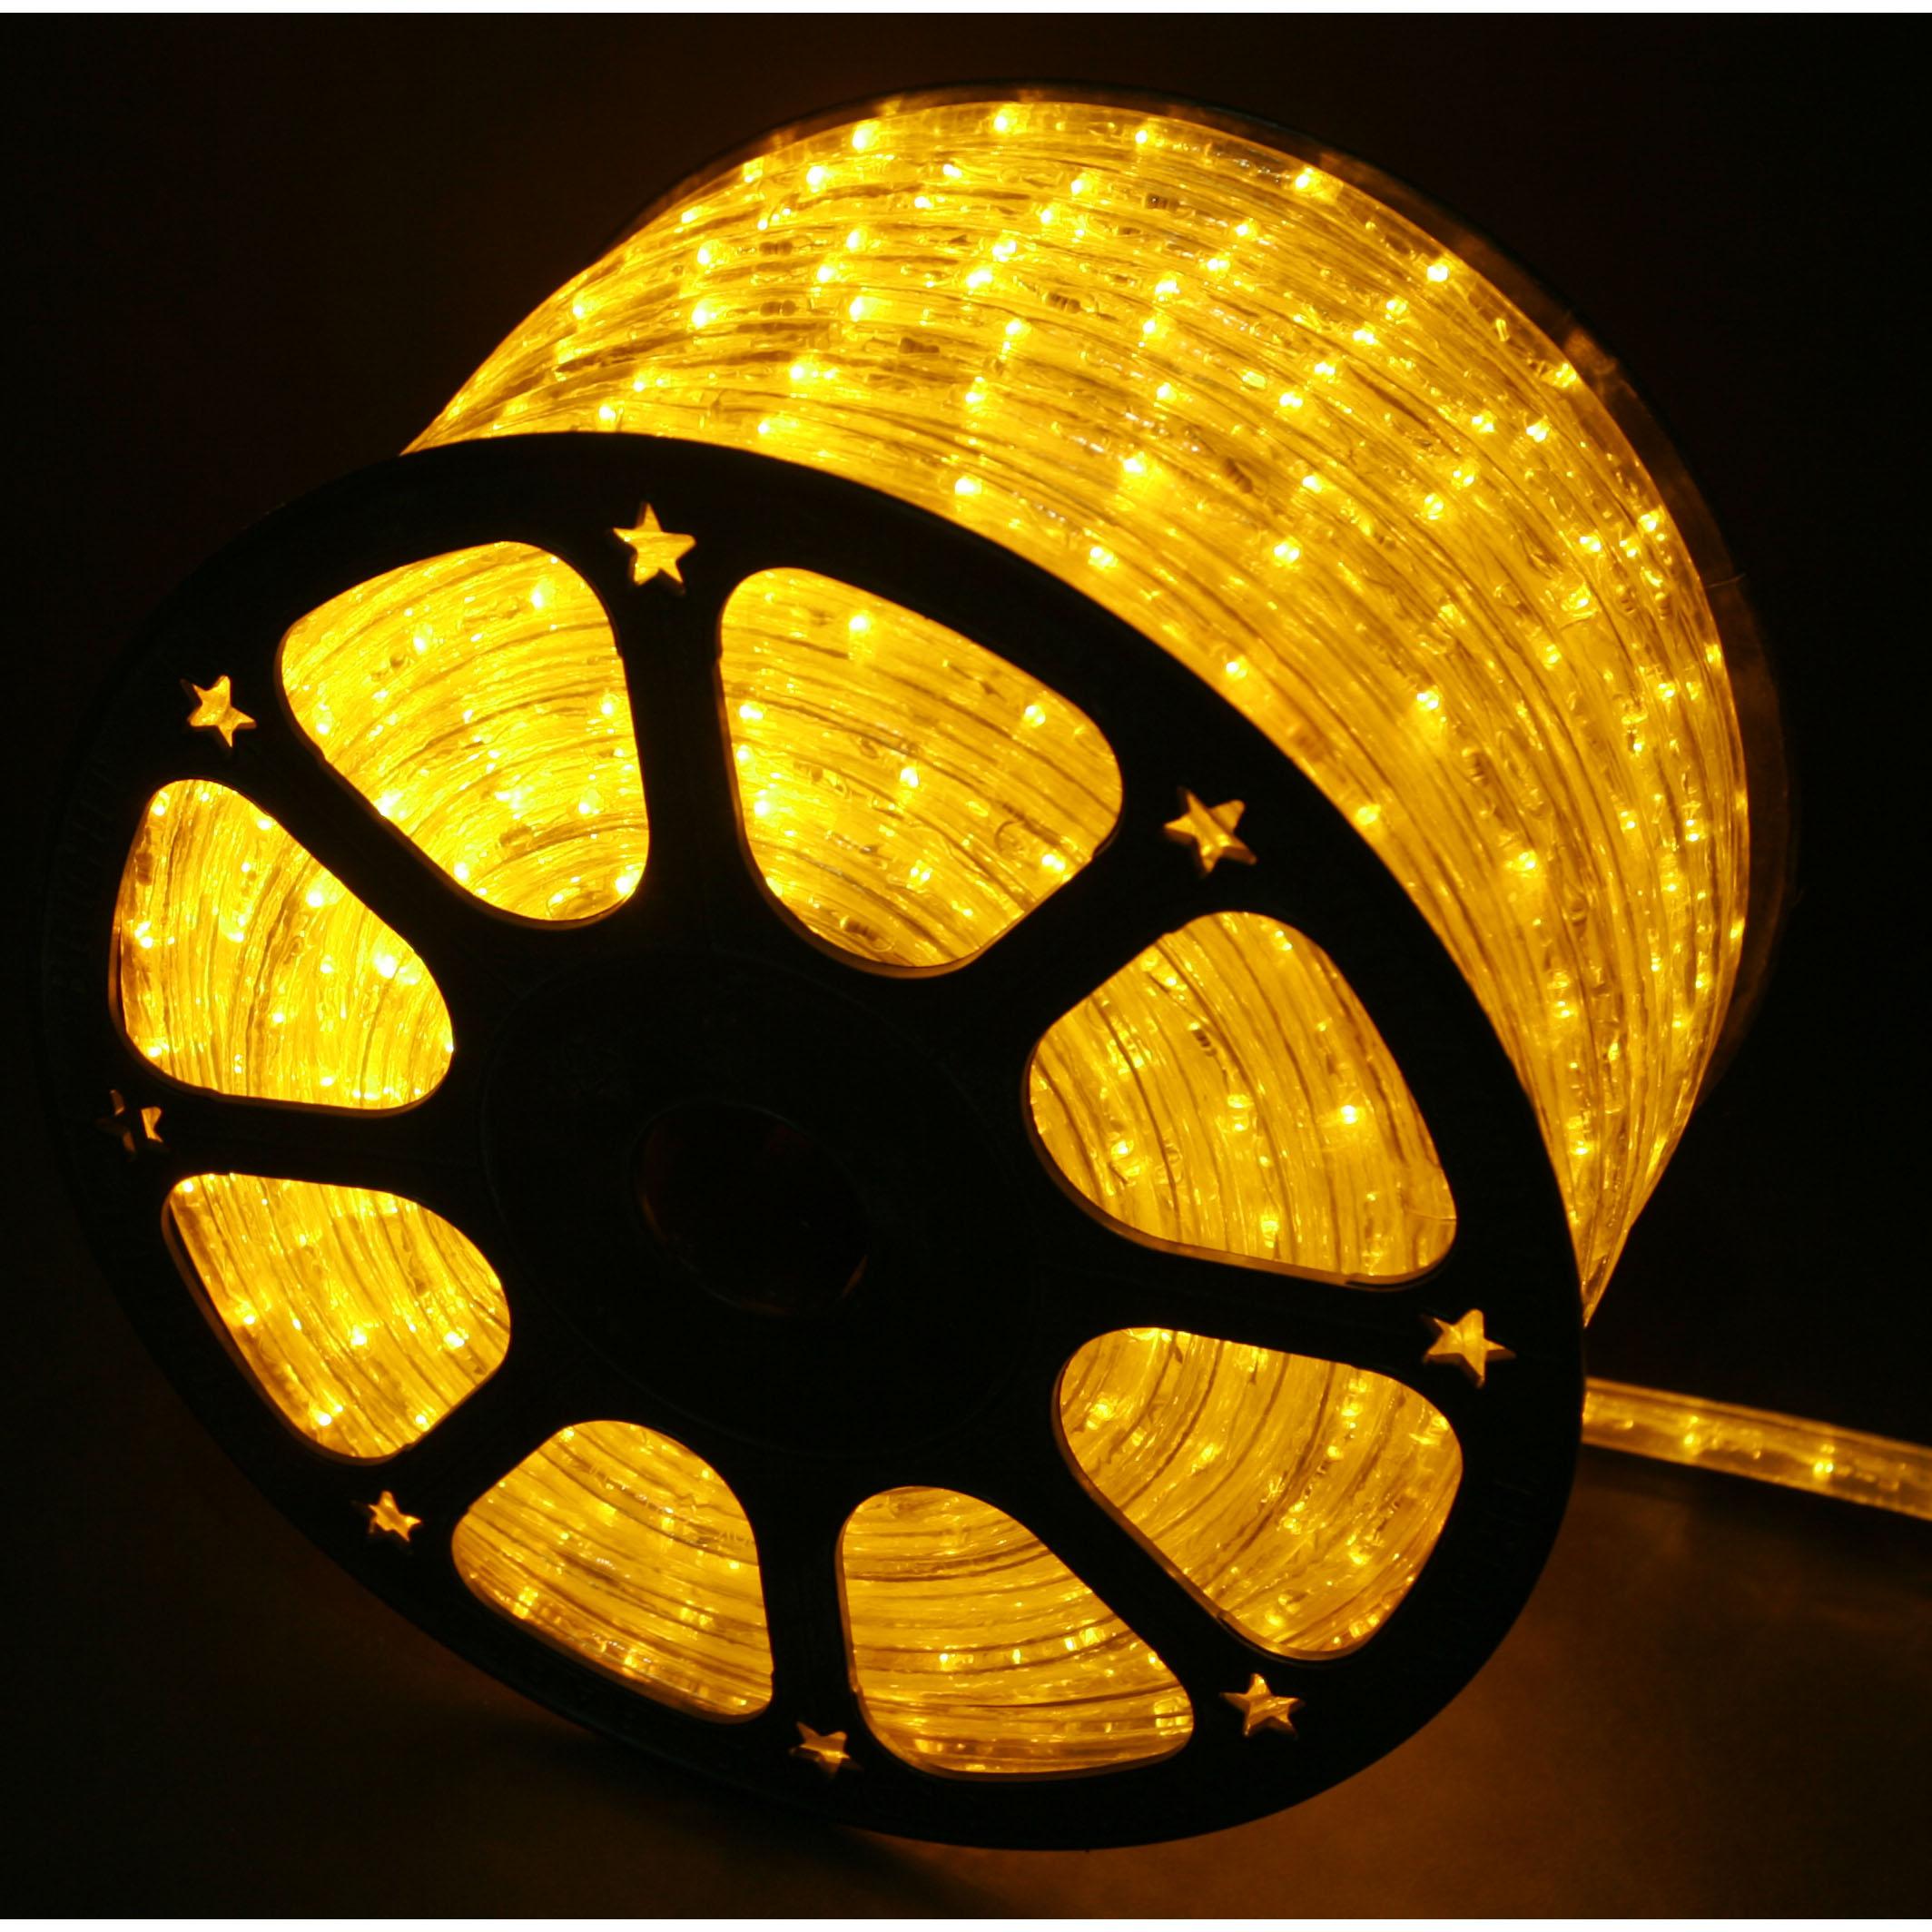 new product 36b51 576ce Yellow LED Rope Lights 148FT RLWL-148-YEL - Direct-Lighting.com